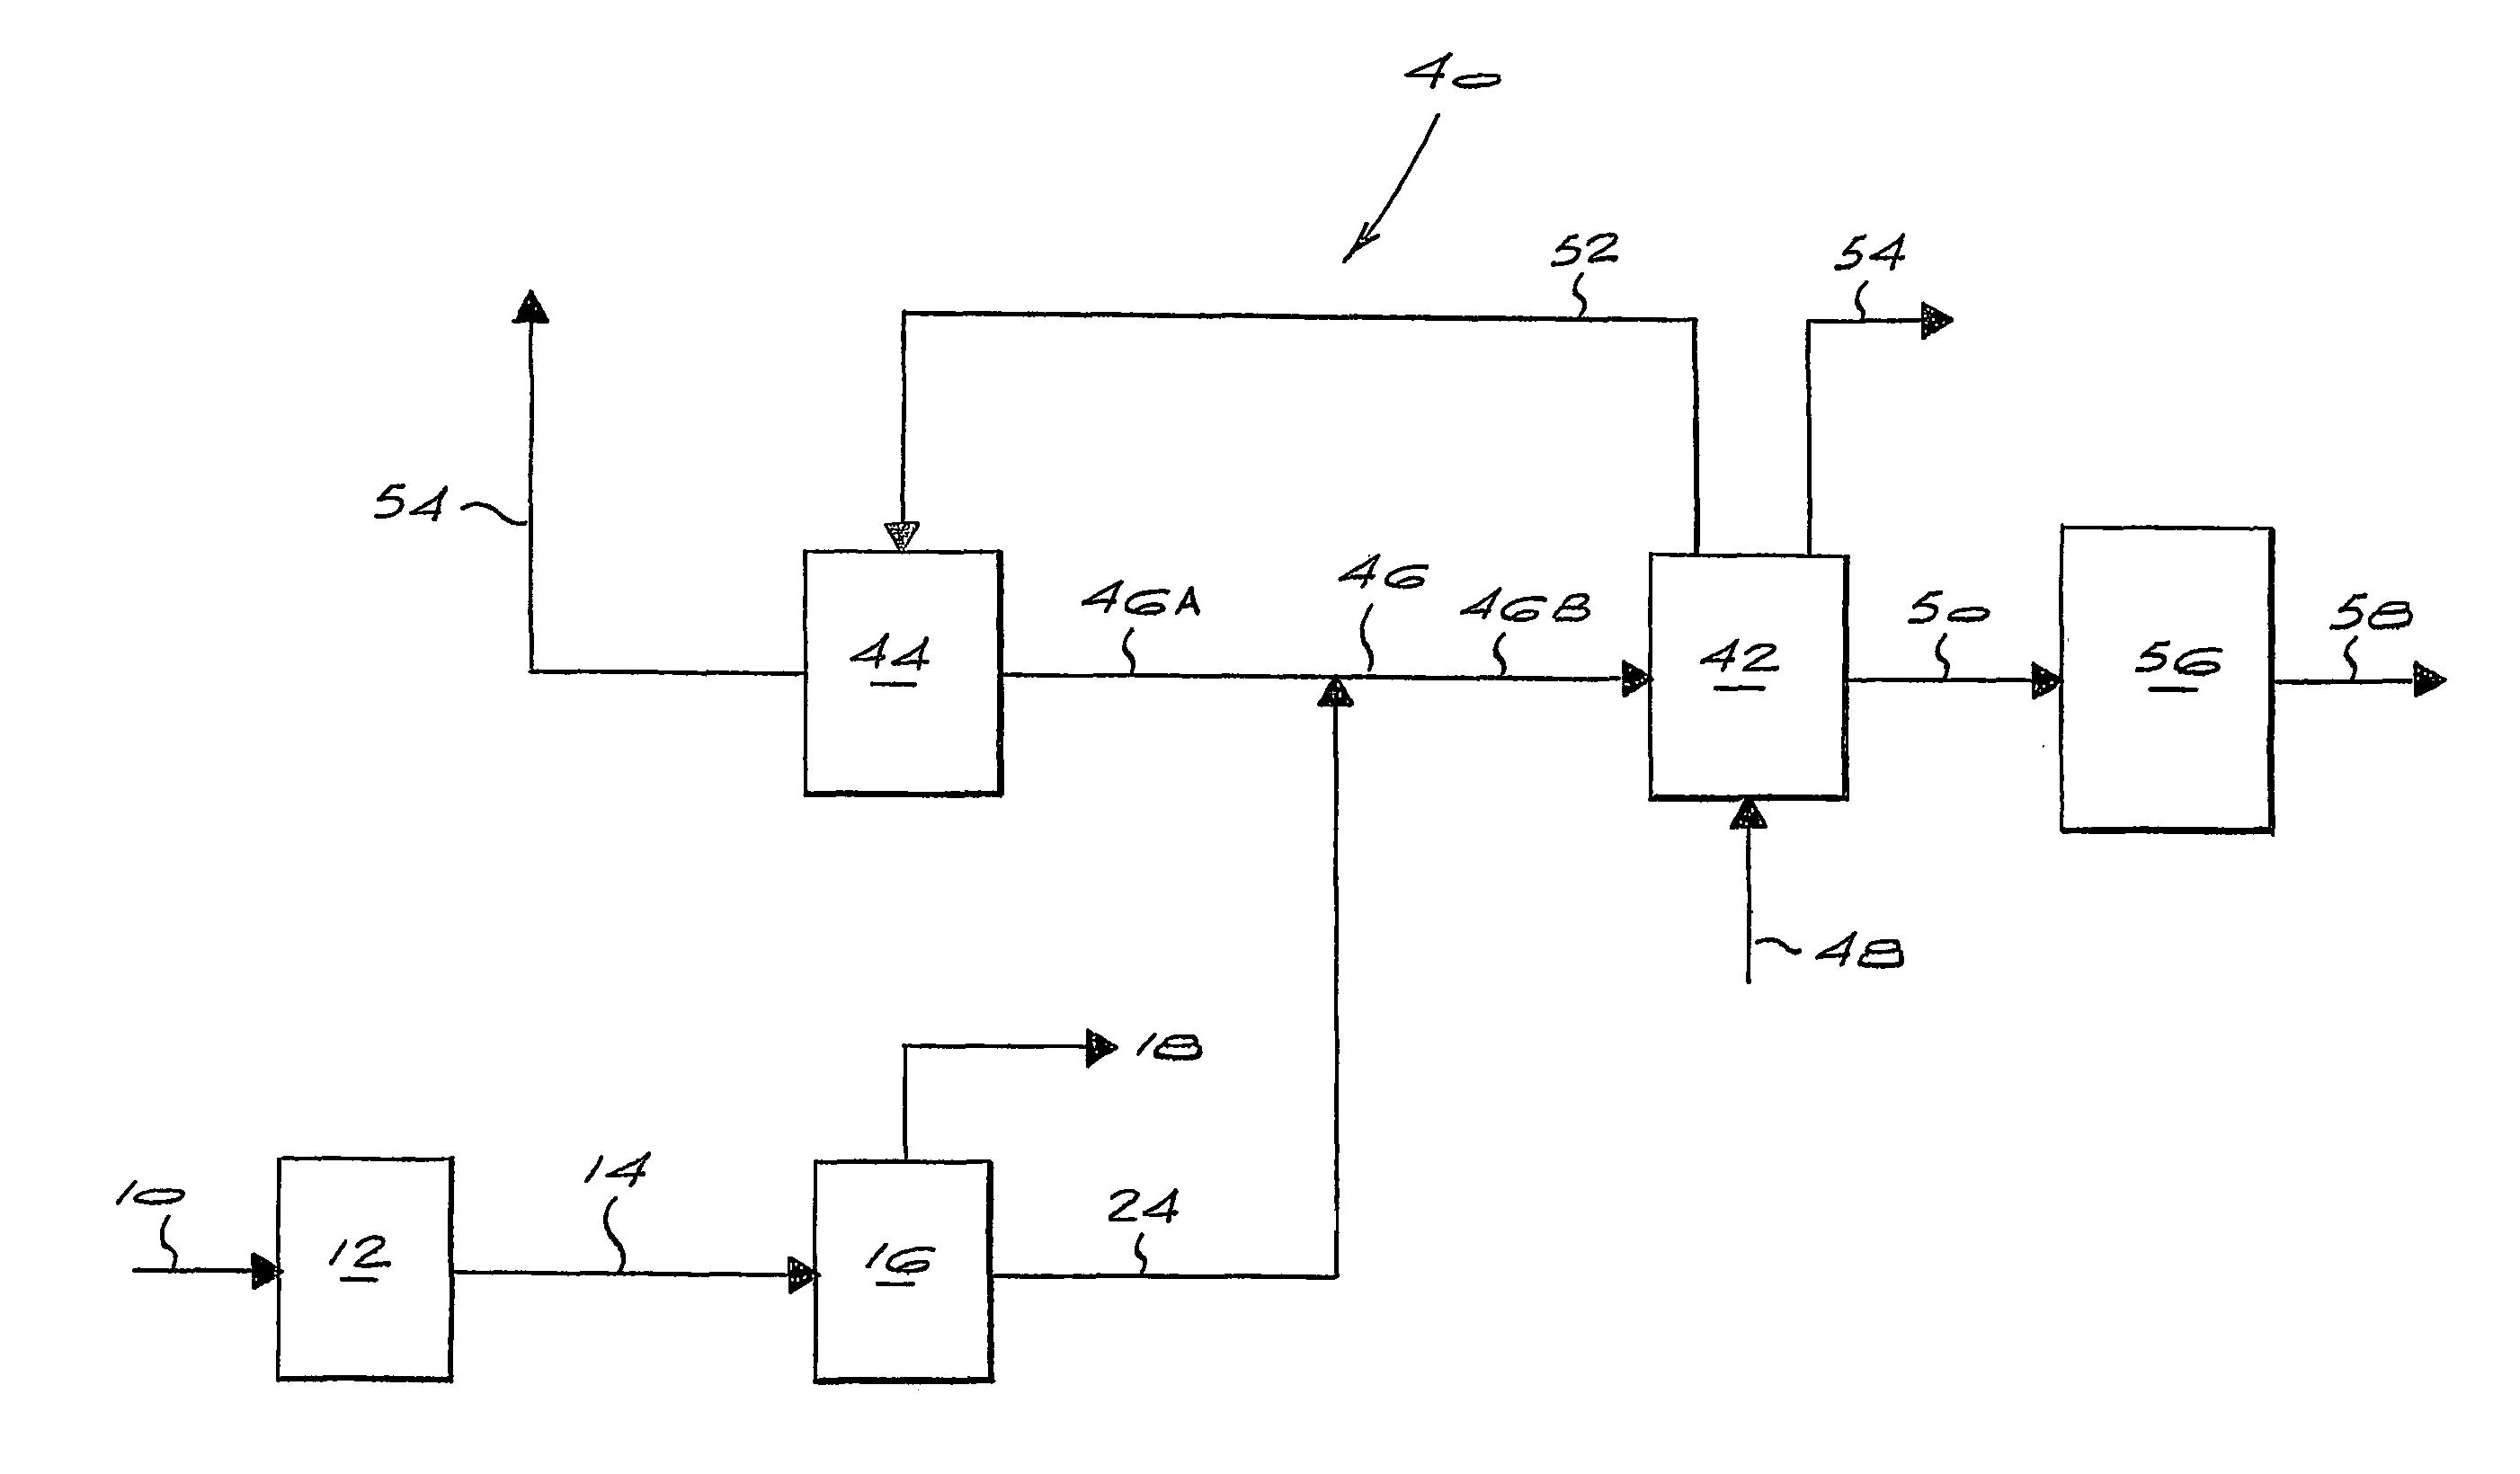 fischer tropsch process flow diagram kenworth t800 wiring schematic patent us7737312 production of linear alkyl benzene